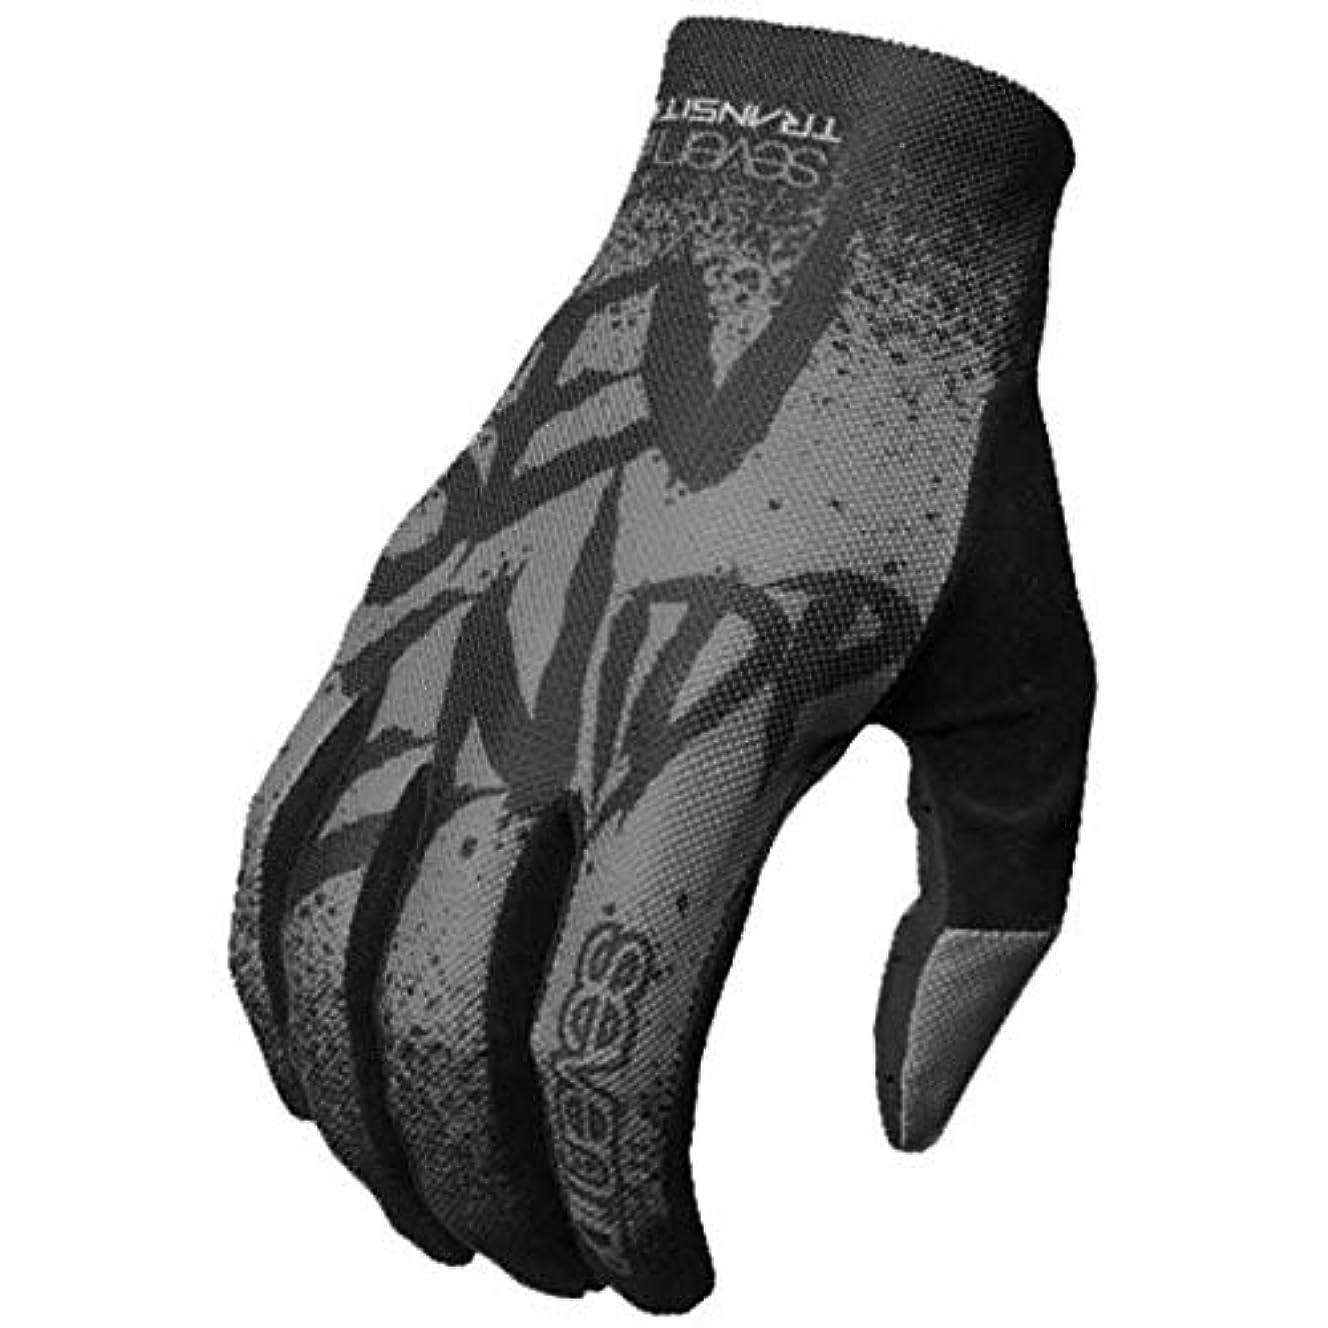 7iDP 7304-85-002 Youth Transition Glove Gradient Graphite/Black YS